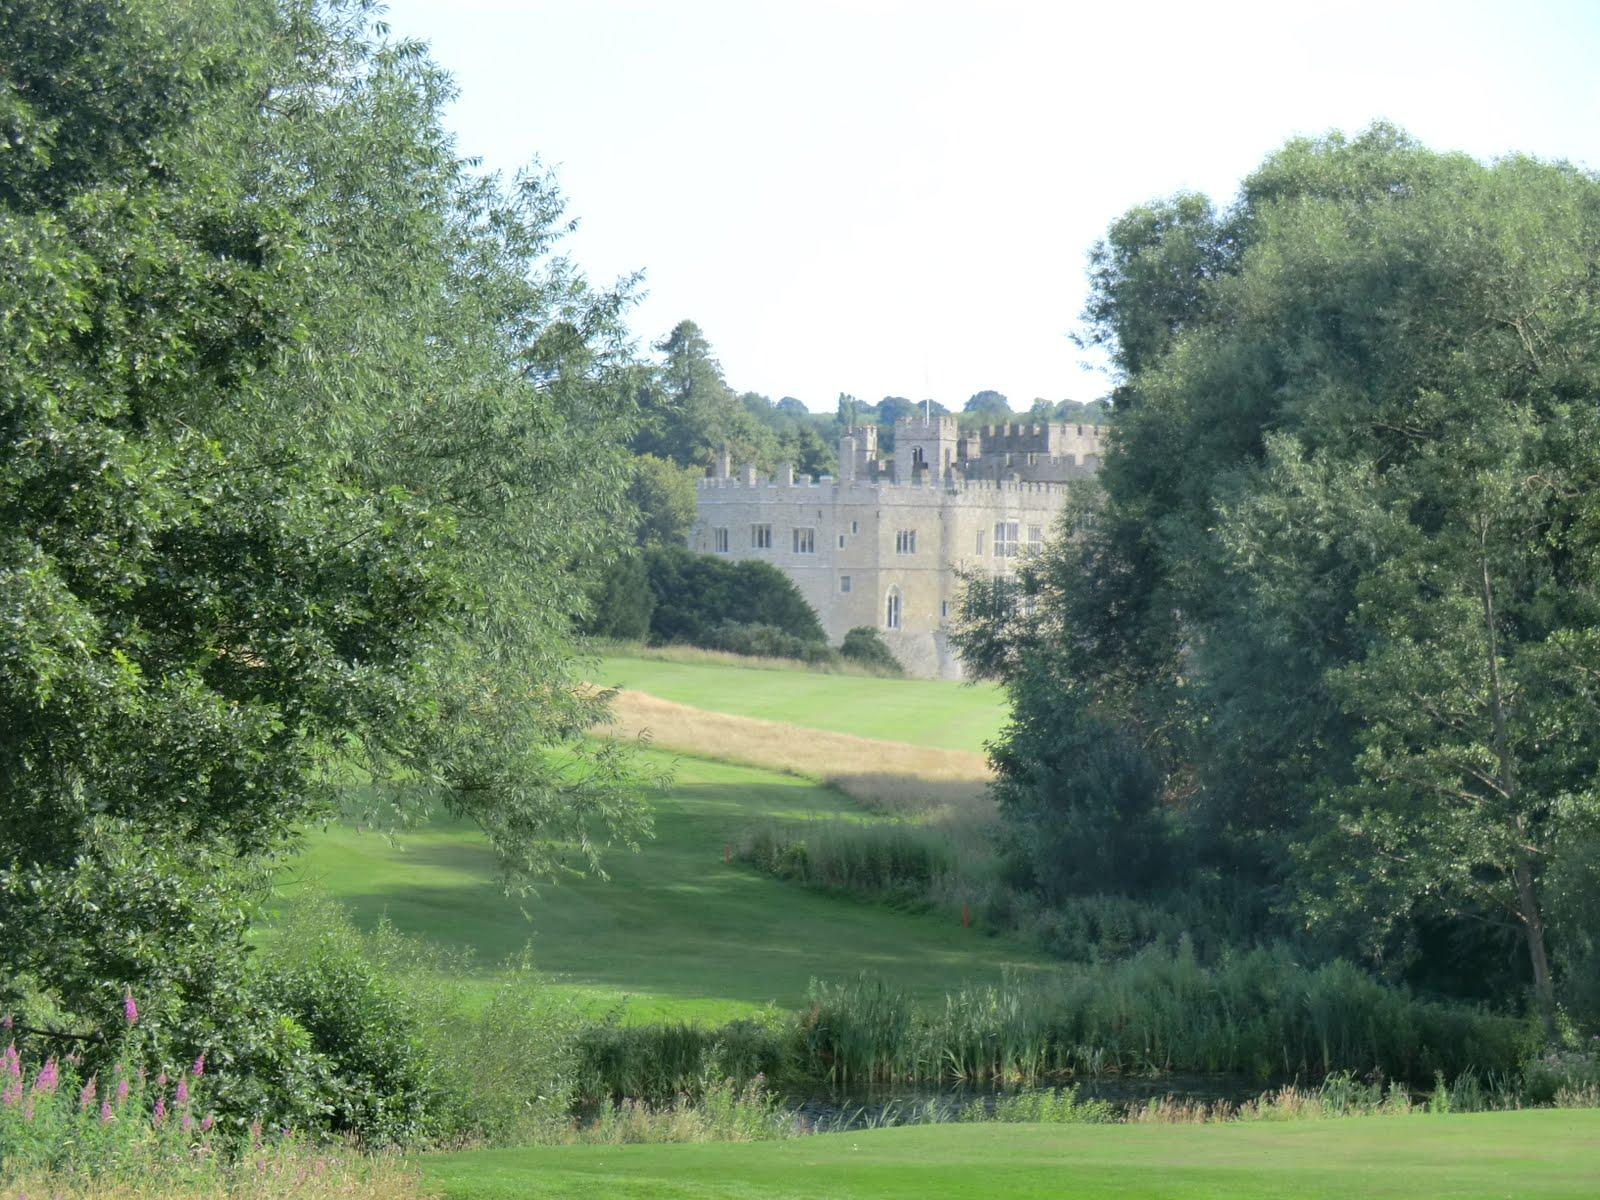 CIMG3017 Across the golf course, Leeds Castle